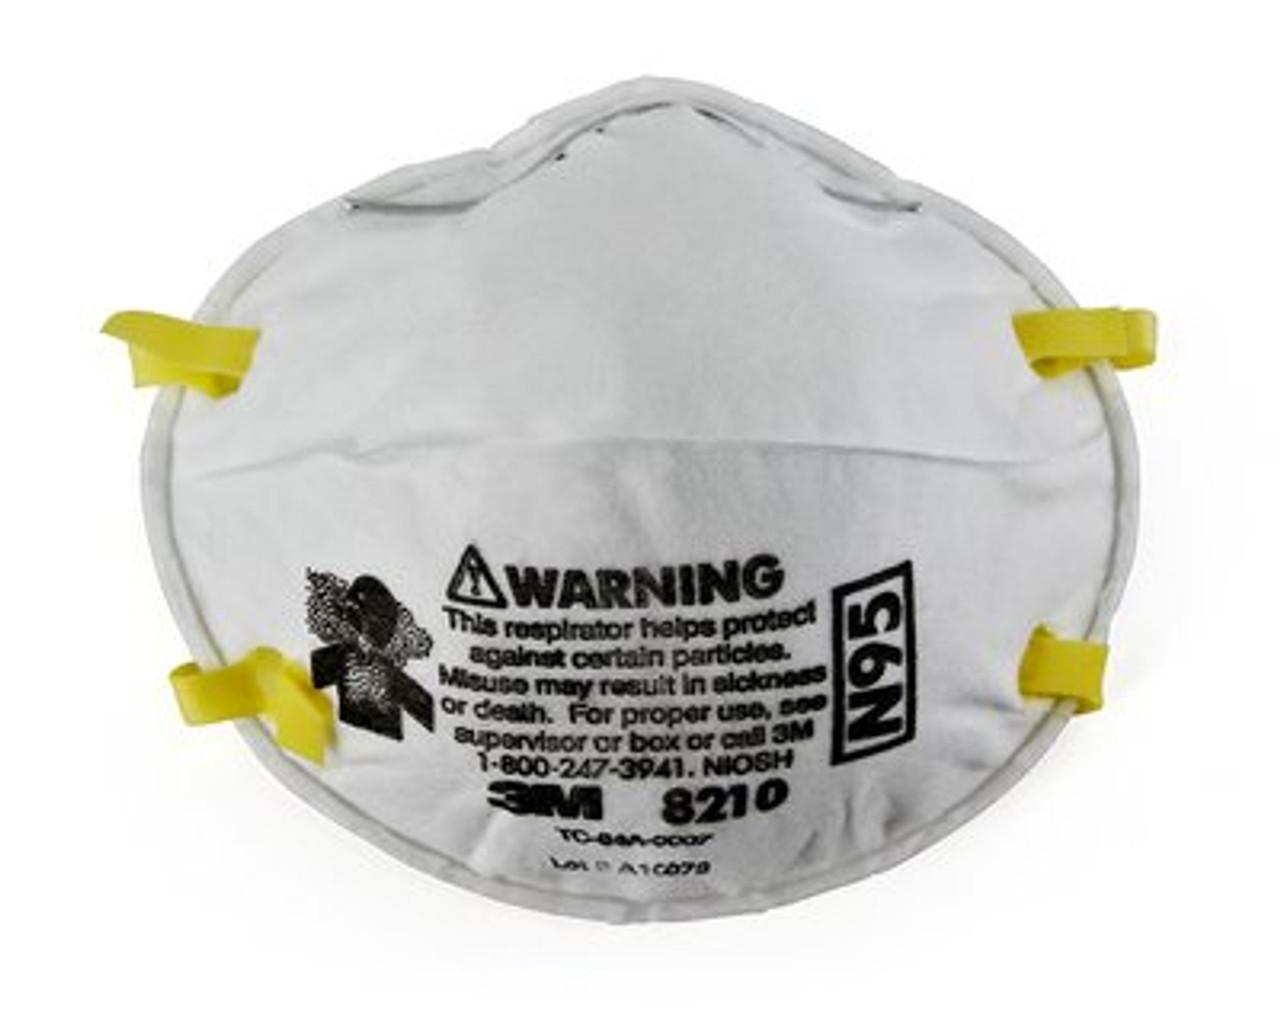 3m 180 n95 mask